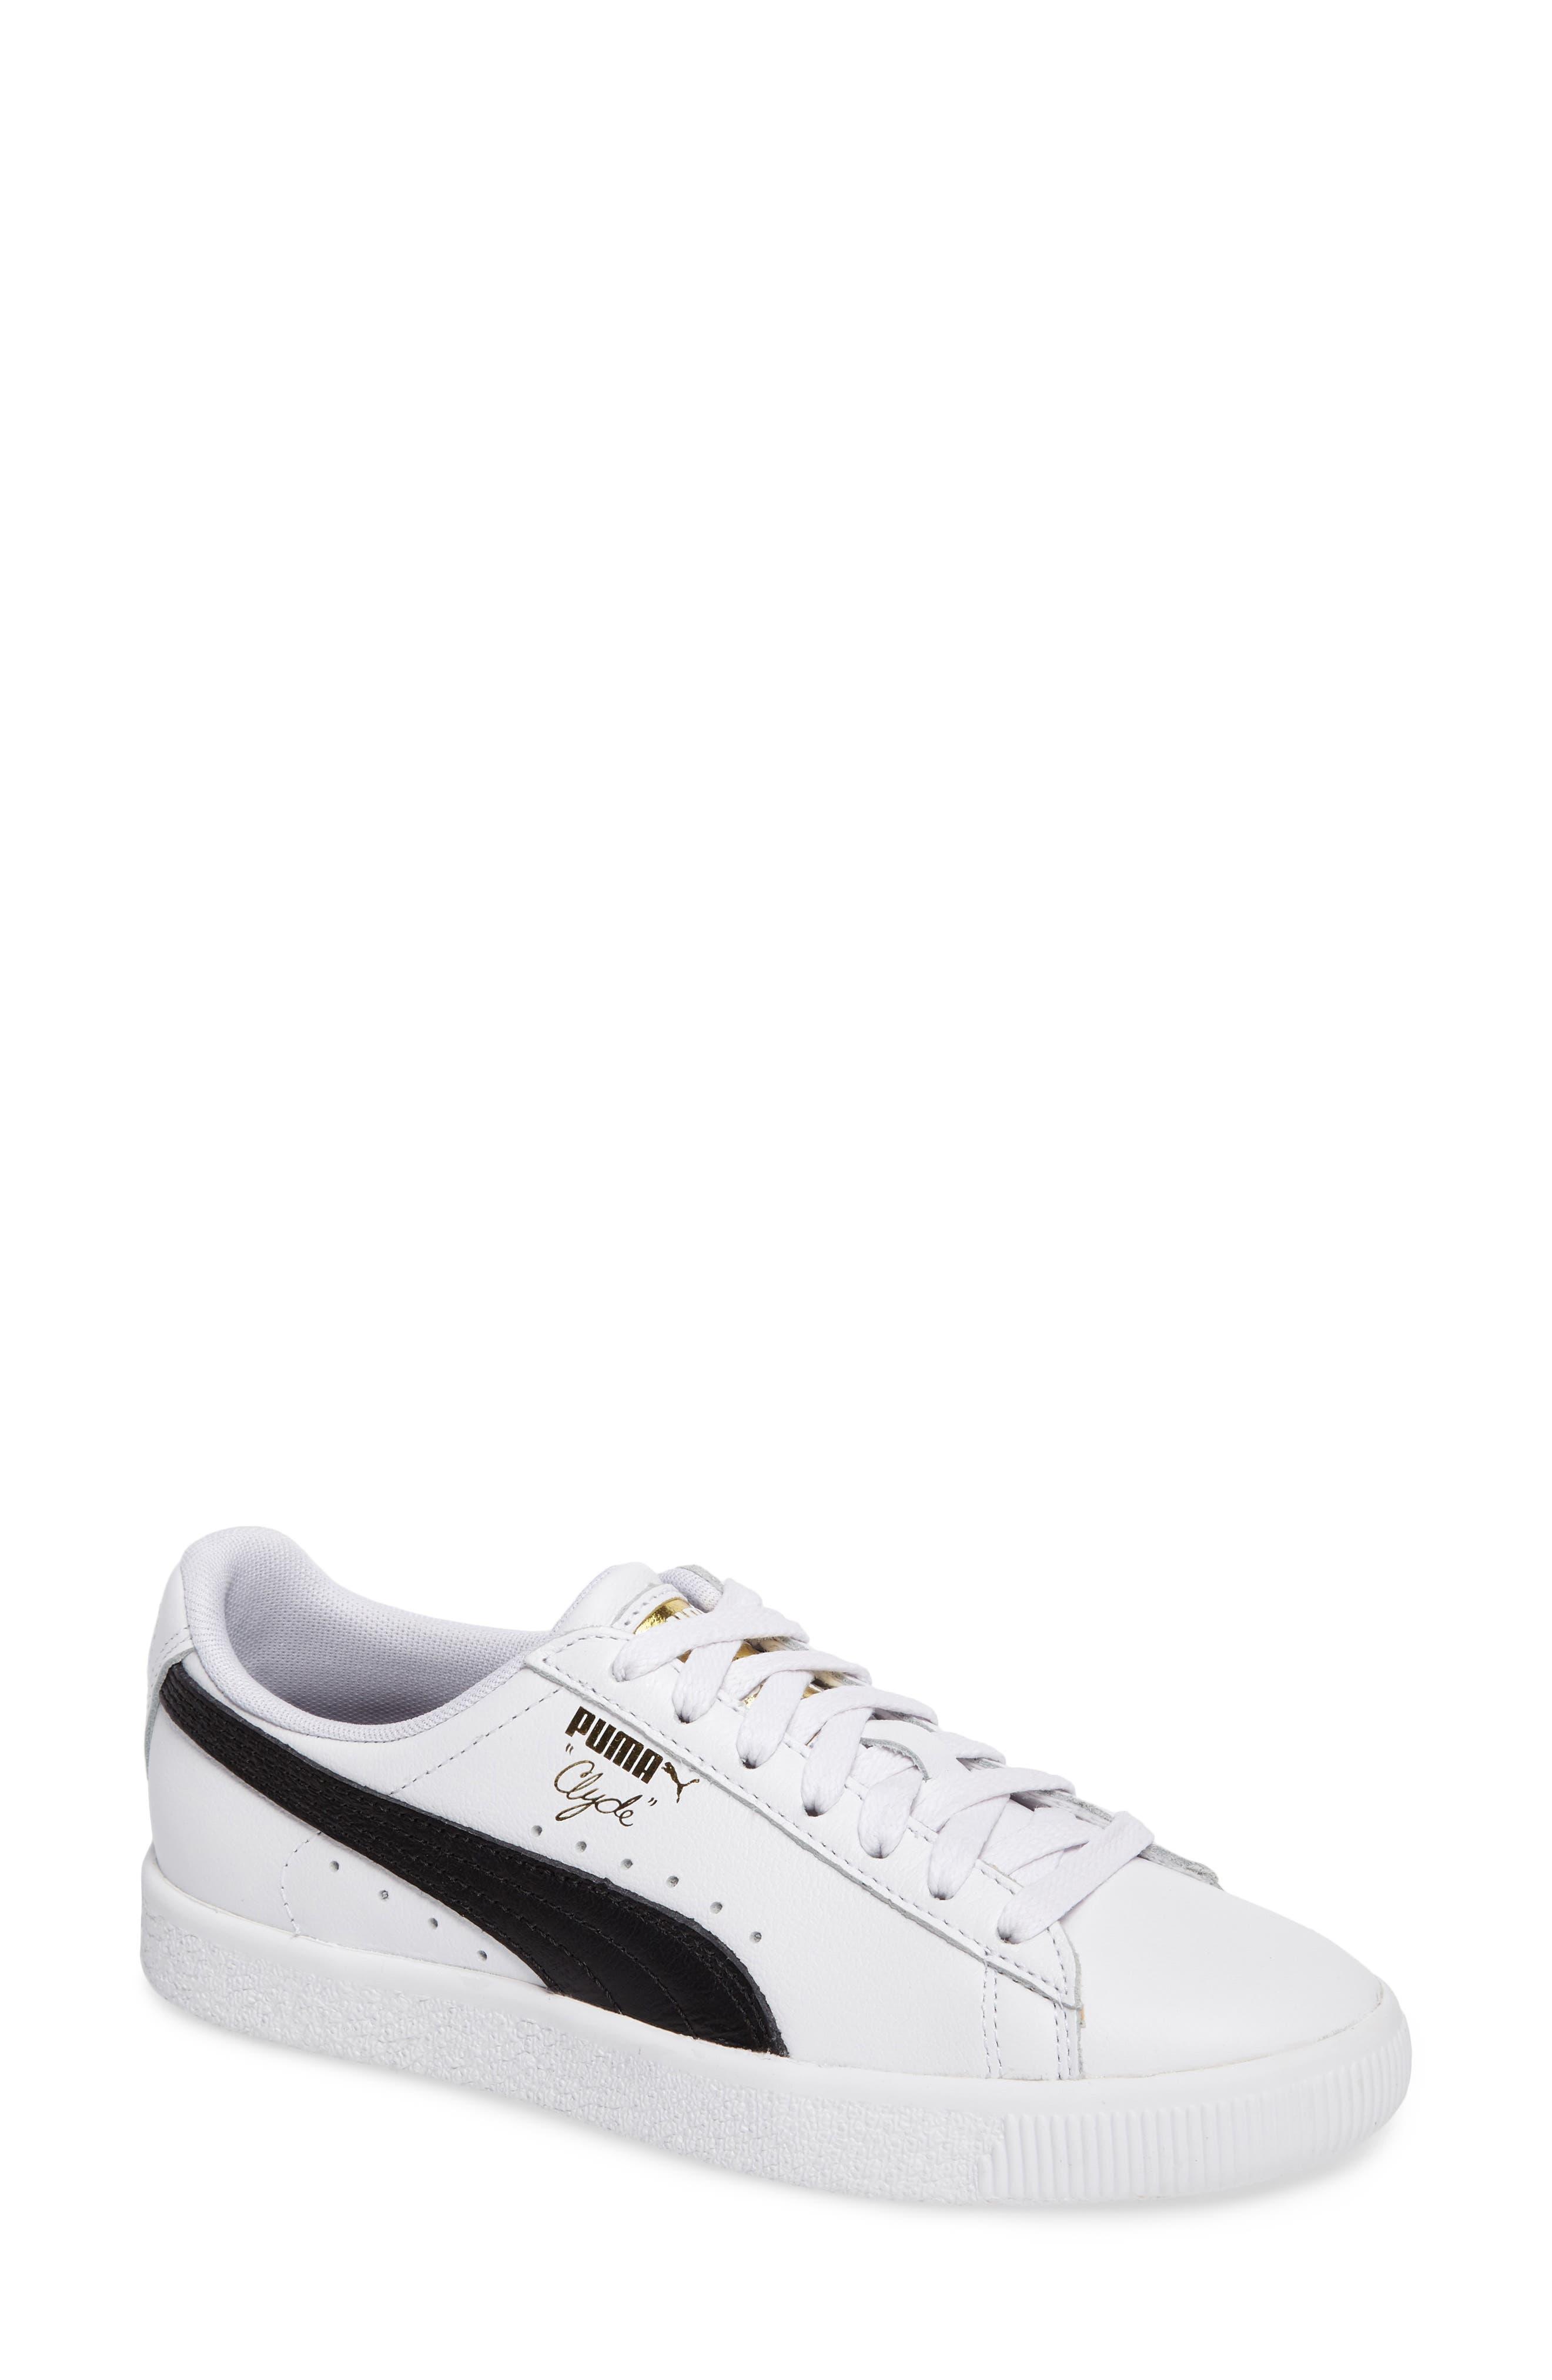 Clyde Sneaker,                             Main thumbnail 1, color,                             WHITE/ BLACK/ GOLD